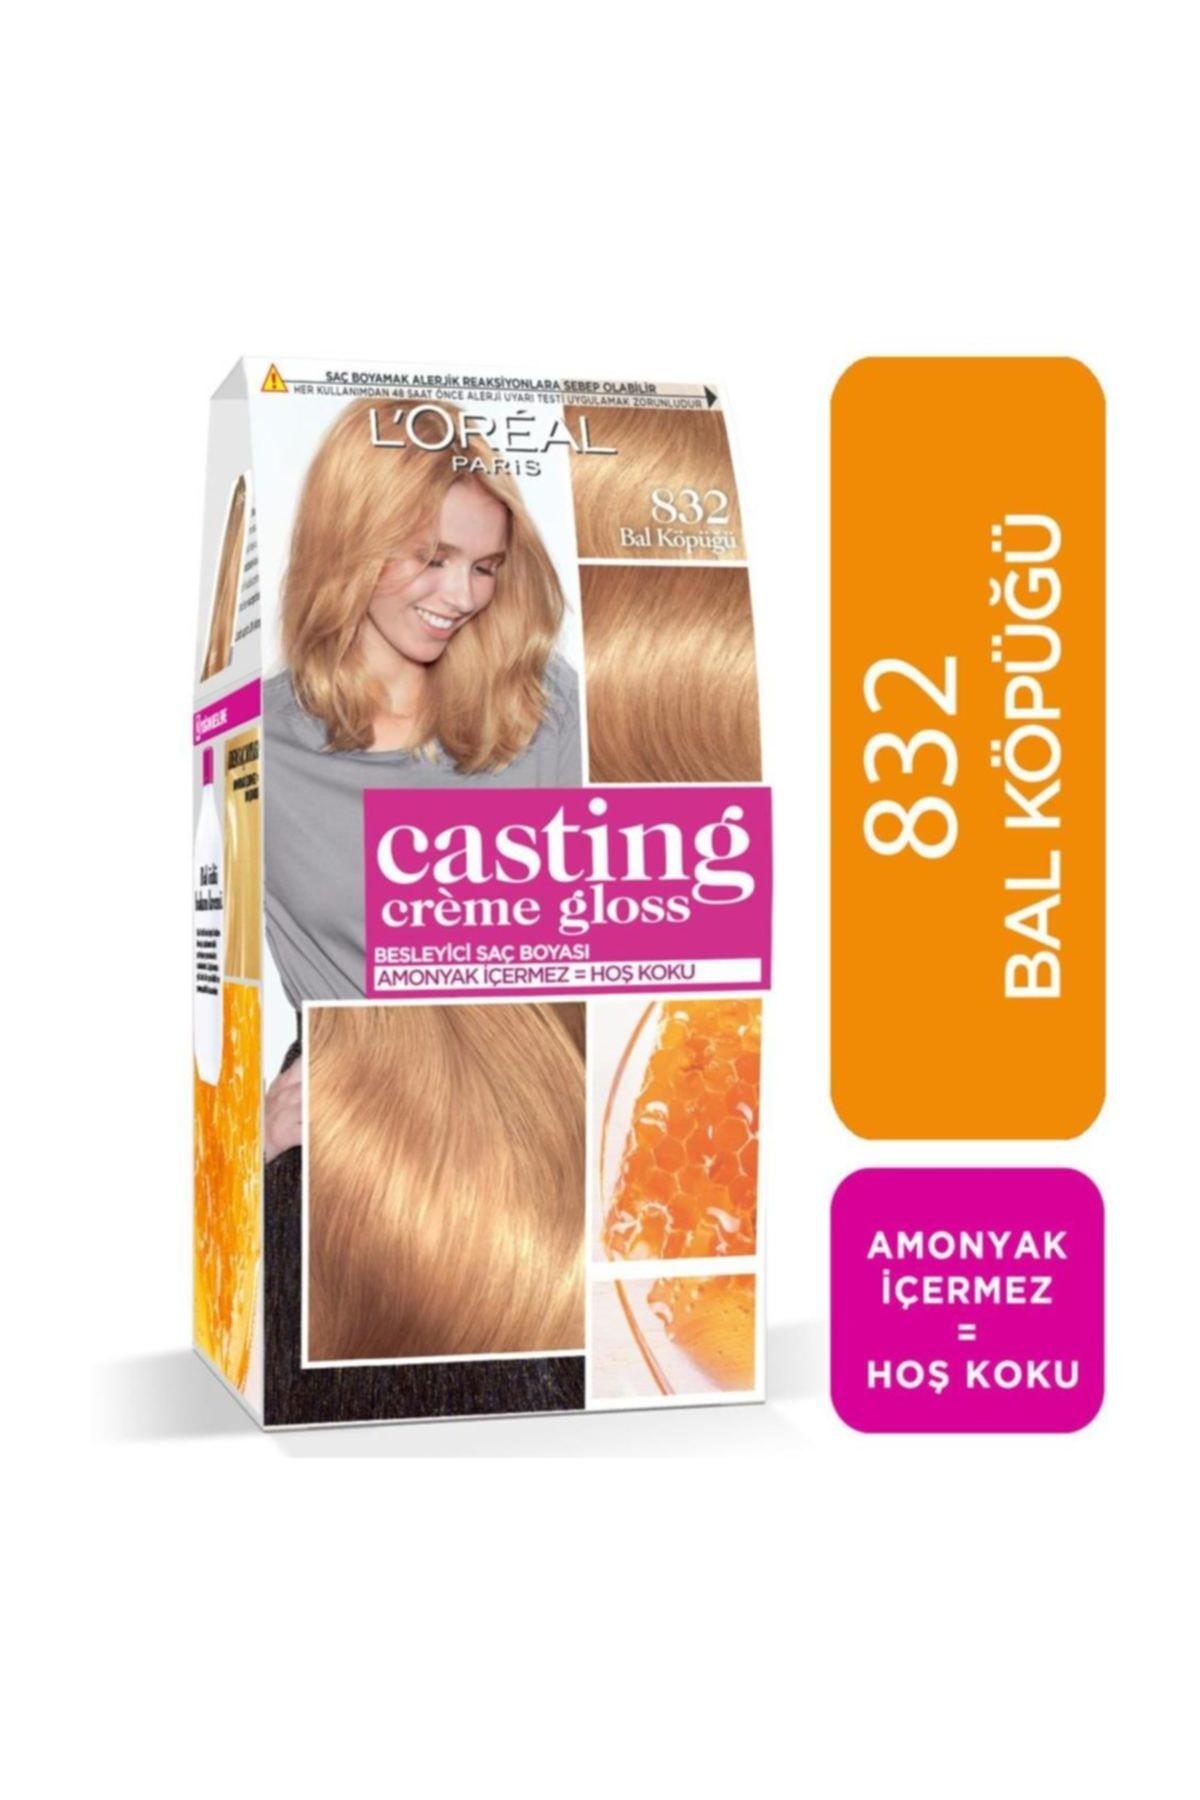 L'Oreal Paris Saç Boyası - Casting Creme Gloss 832 Bal Köpüğü 3600523291502 1